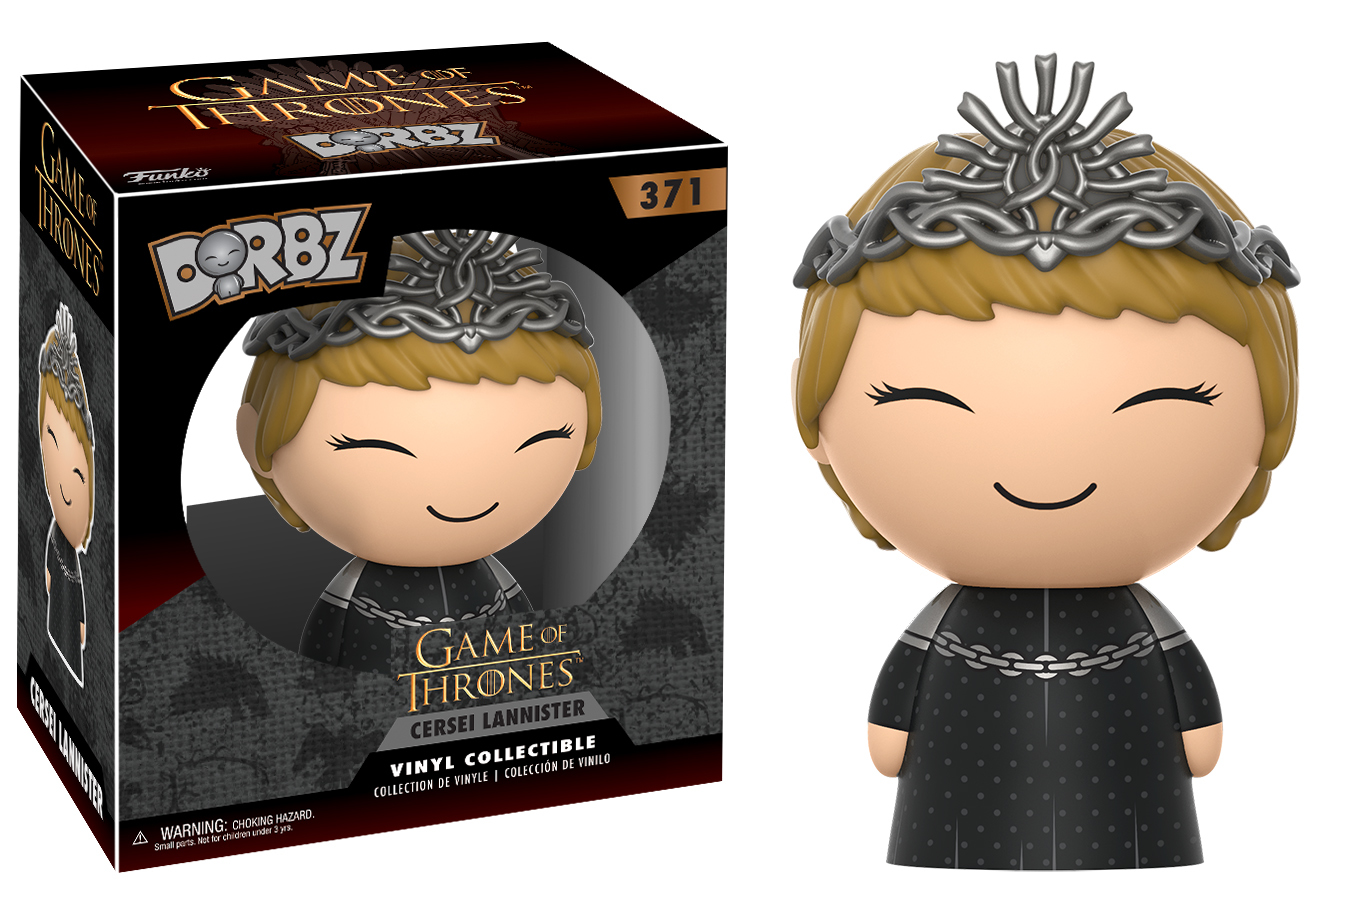 Game of Thrones - Cersei Lannister Dorbz Vinyl Figure image